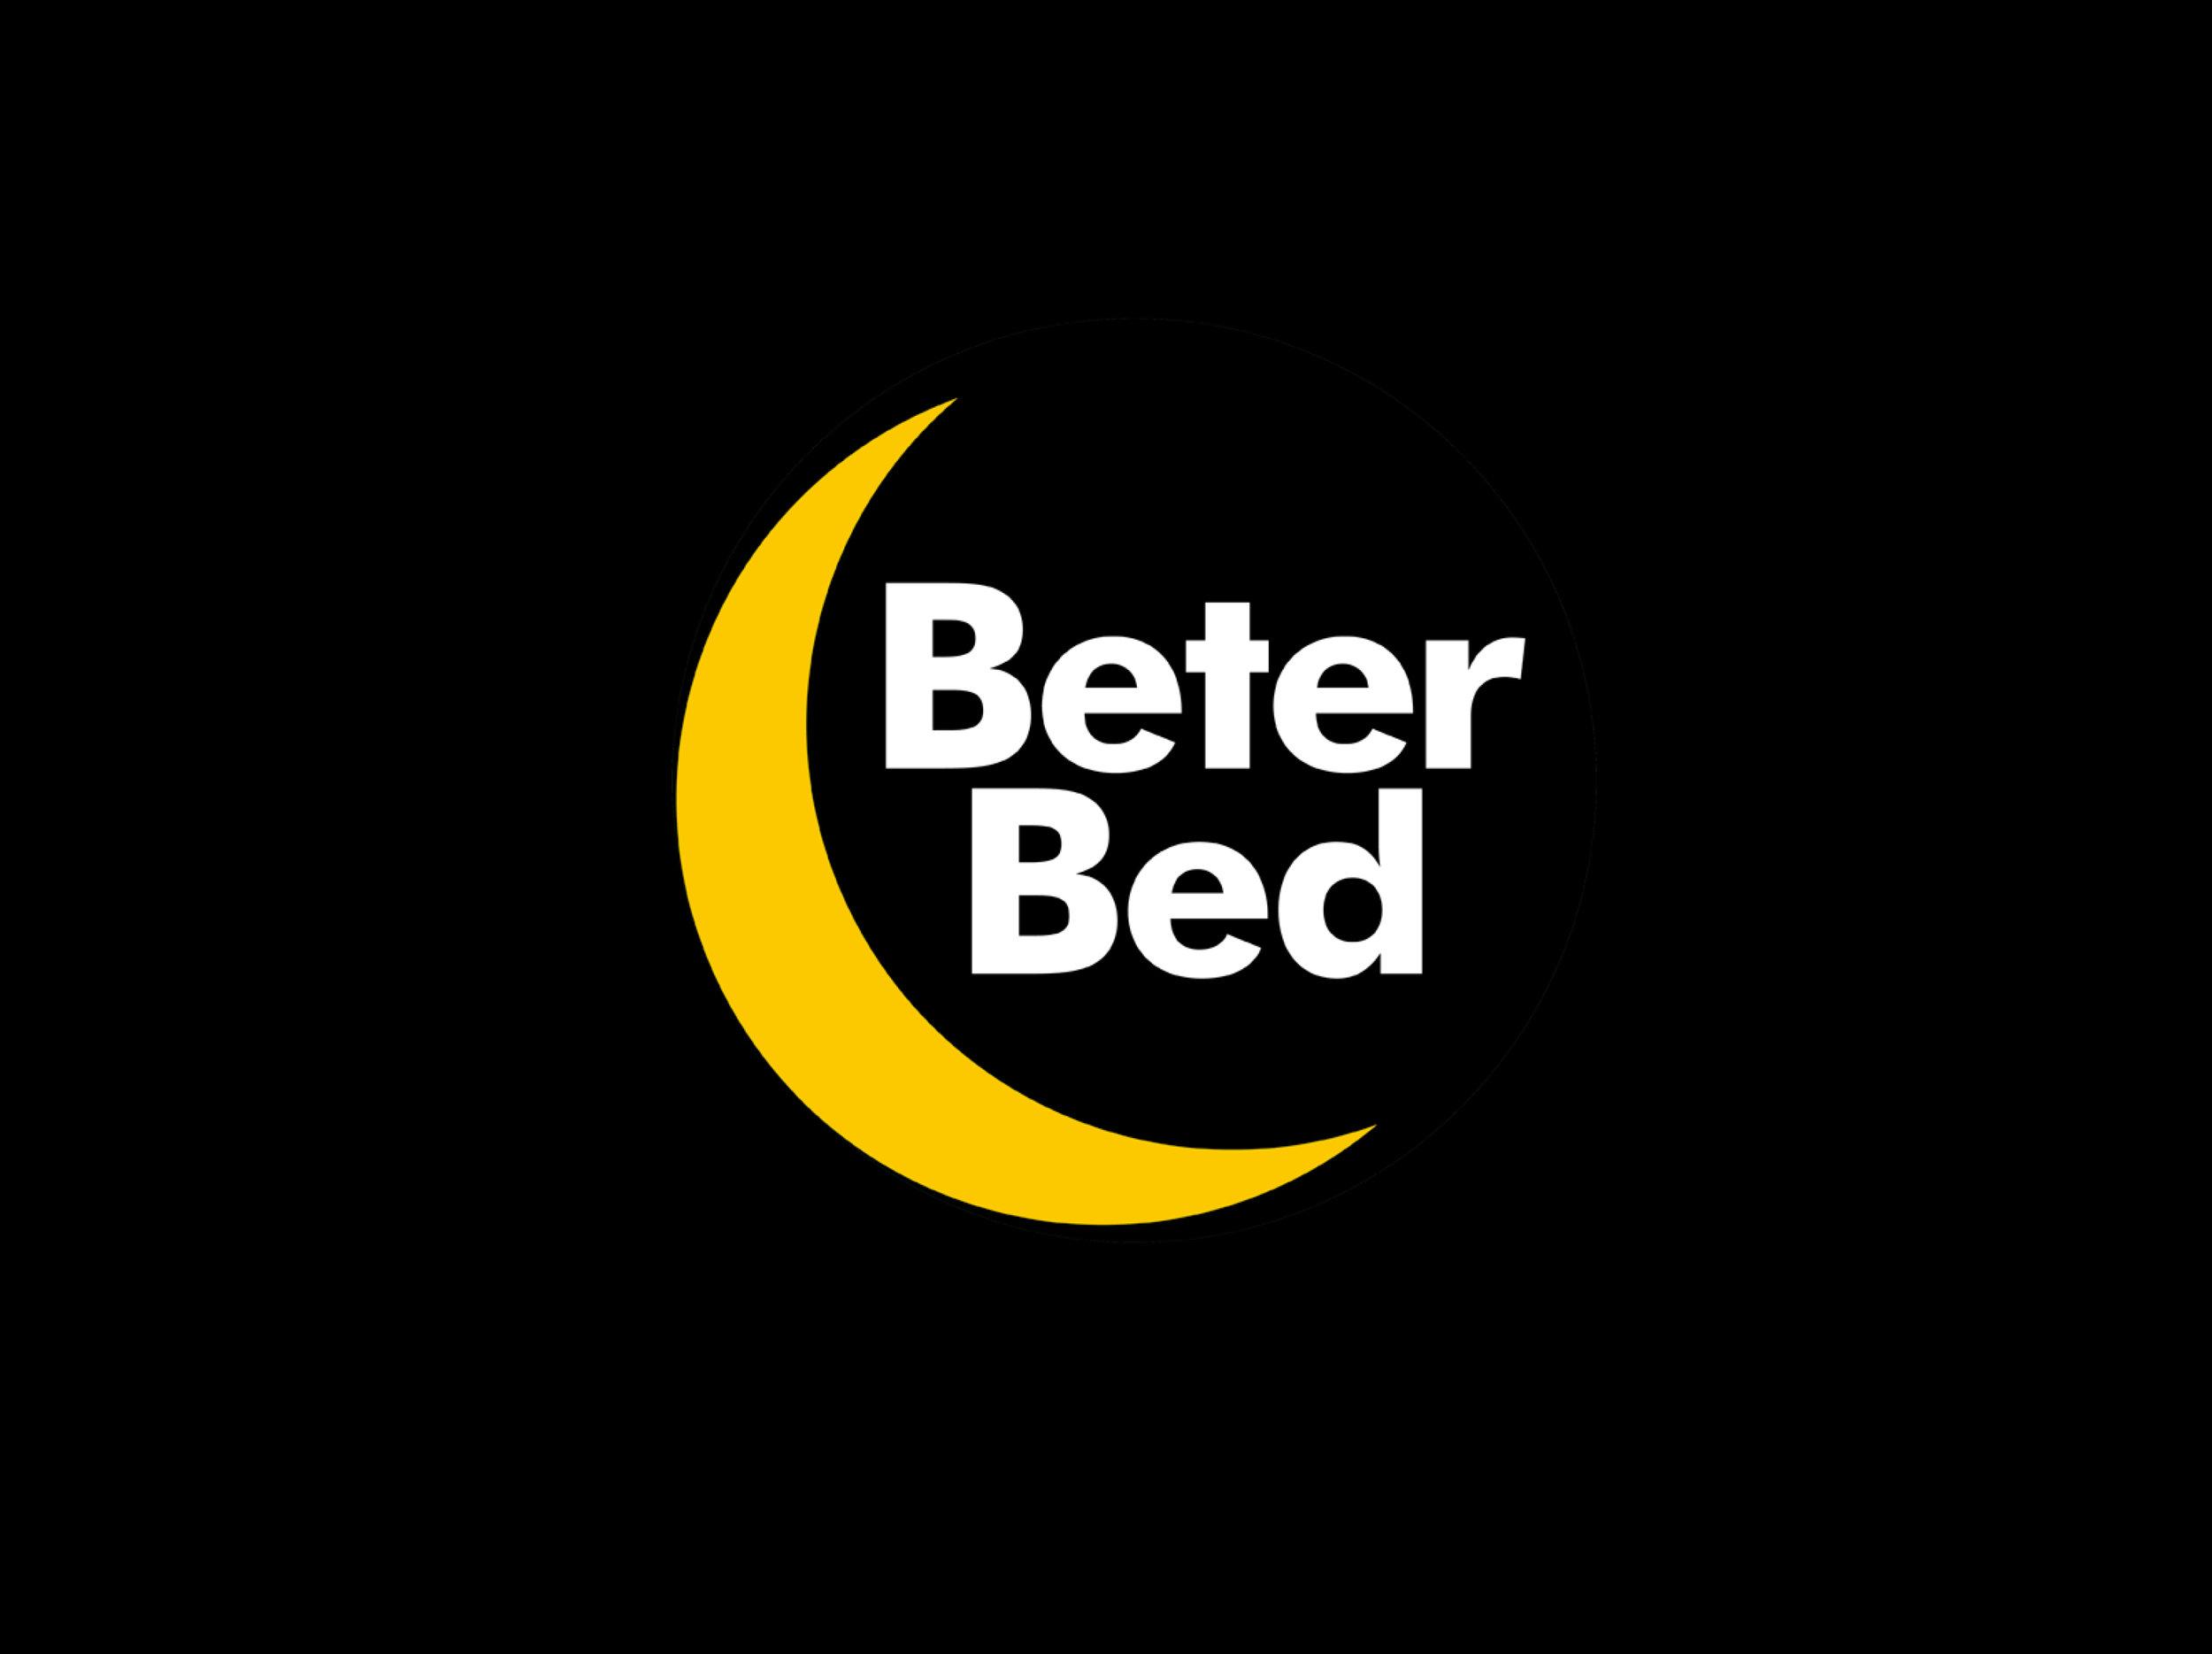 Beter Bed identity.jpg